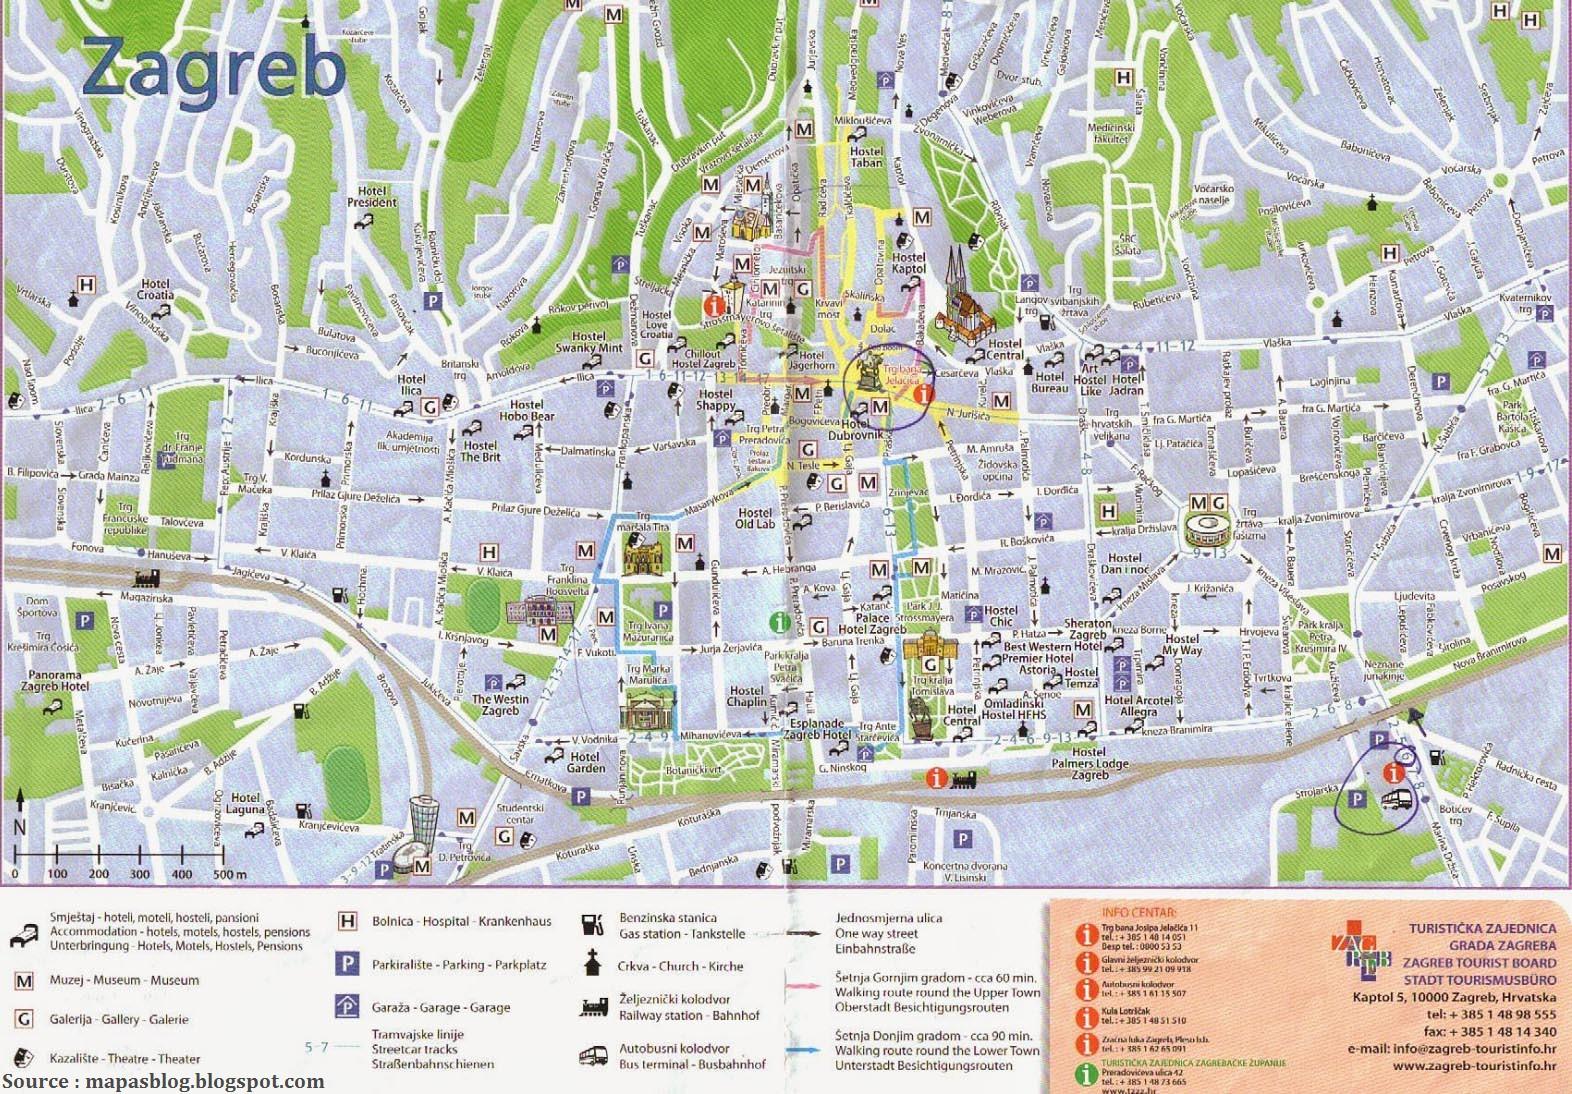 Plan Zagreb map